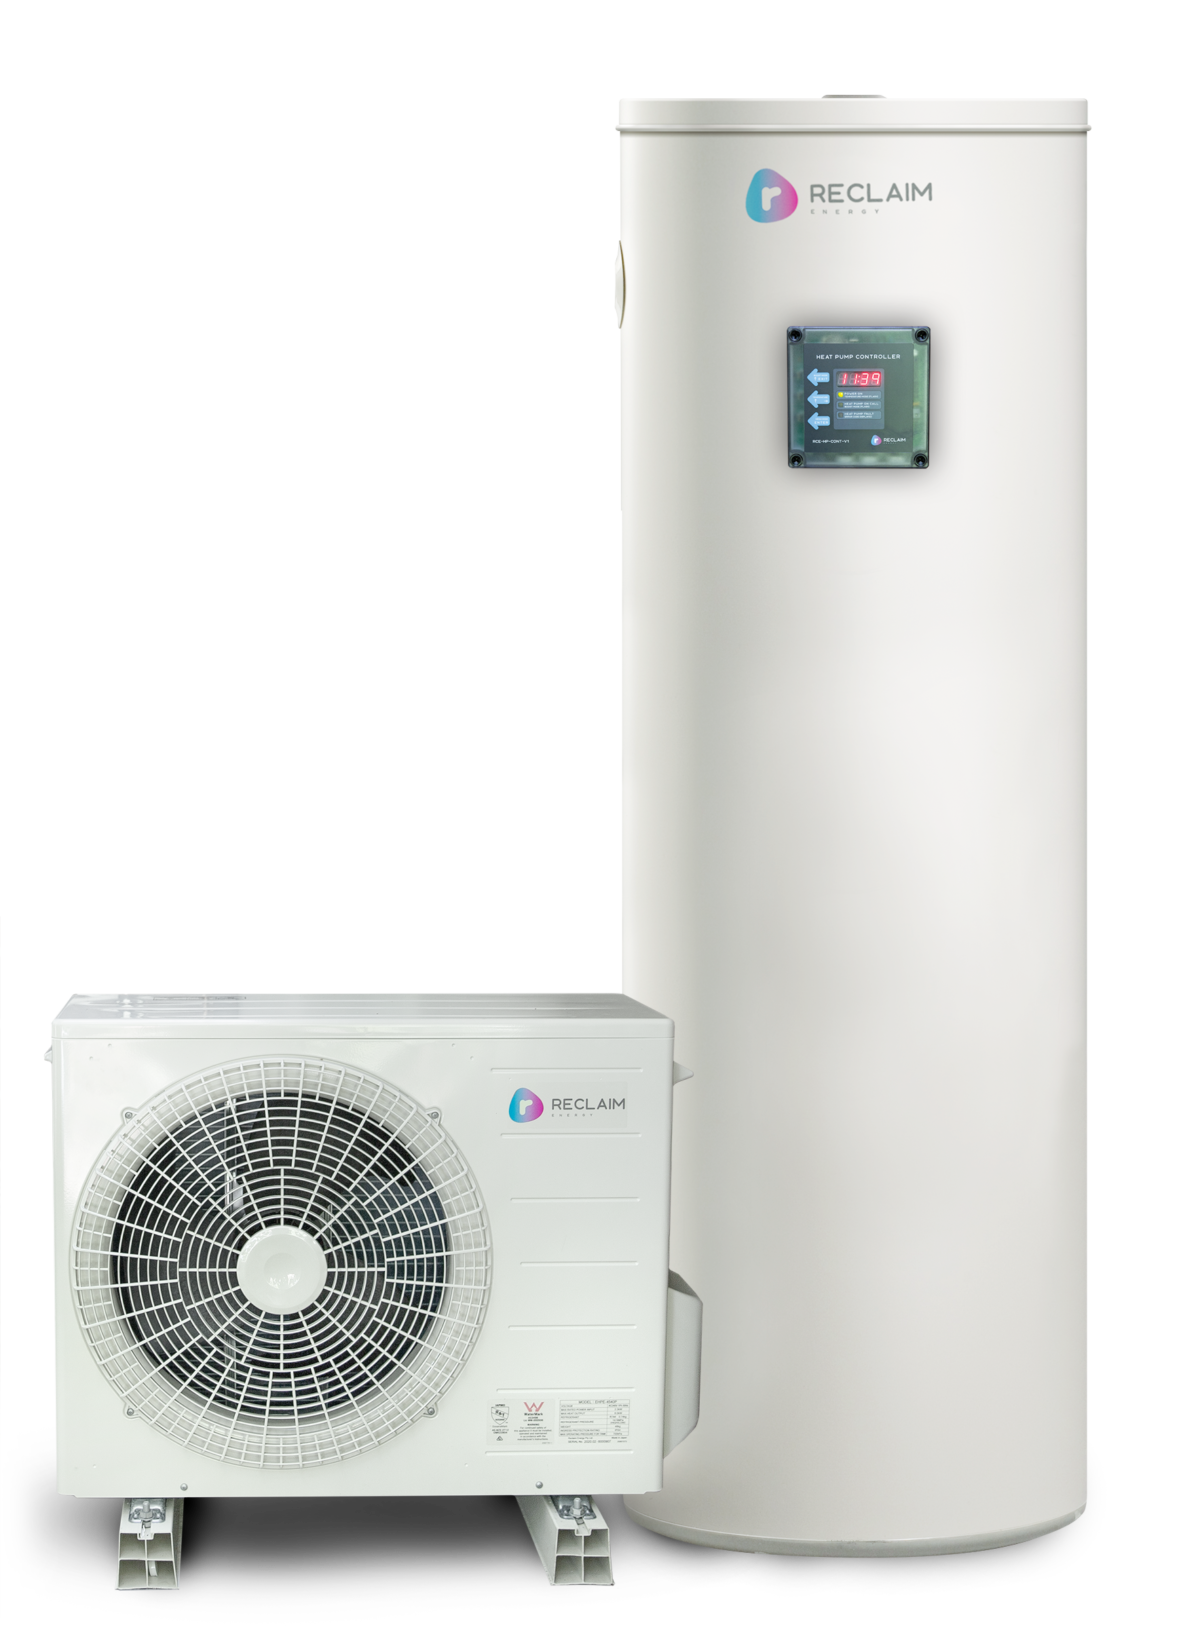 Reclaim Heat Pump System No Bg rgb web 02 1200x1639